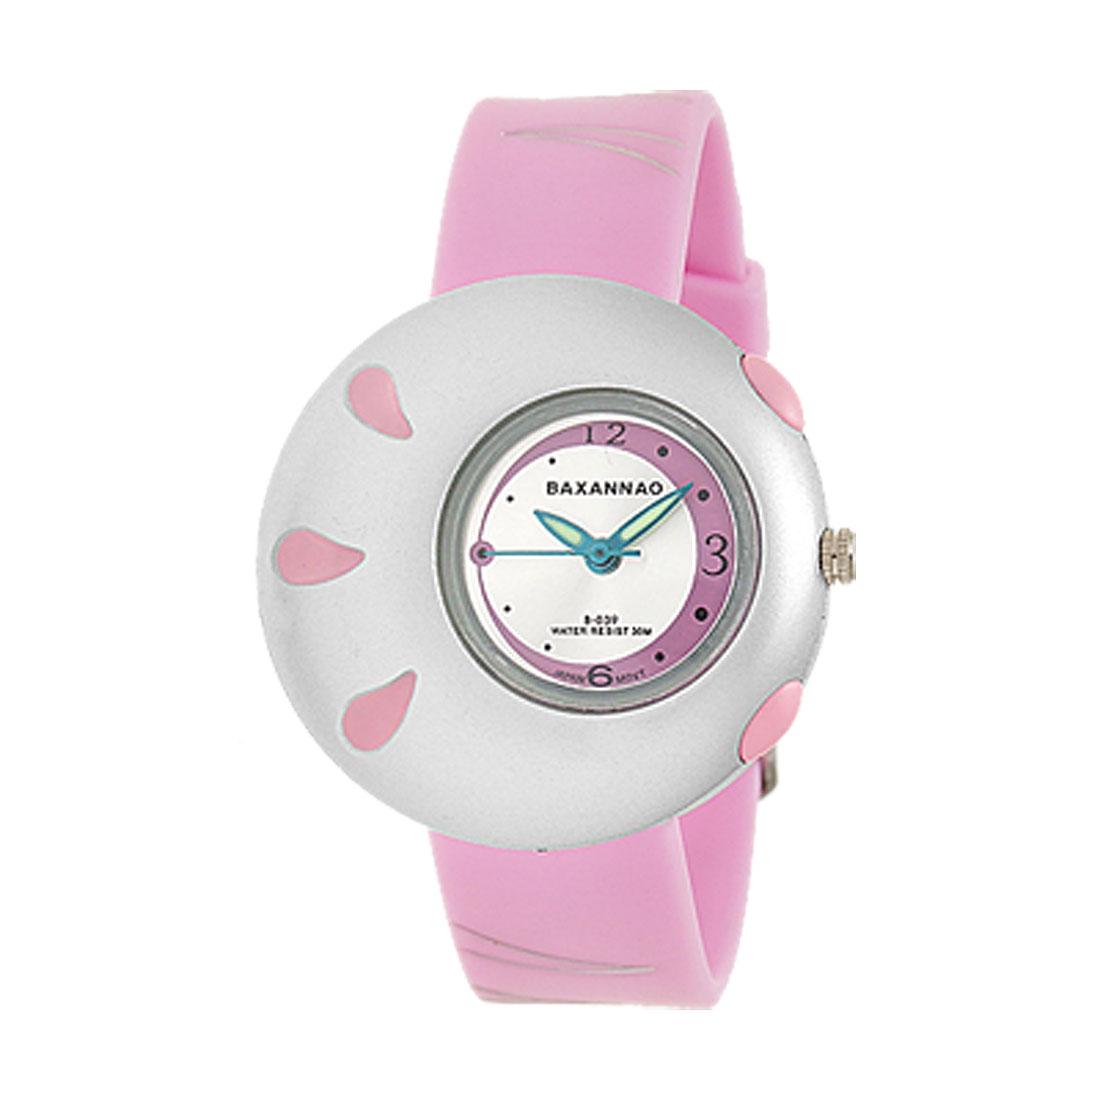 Stylish Pink Pasnew Sports Wrist Watch for Students